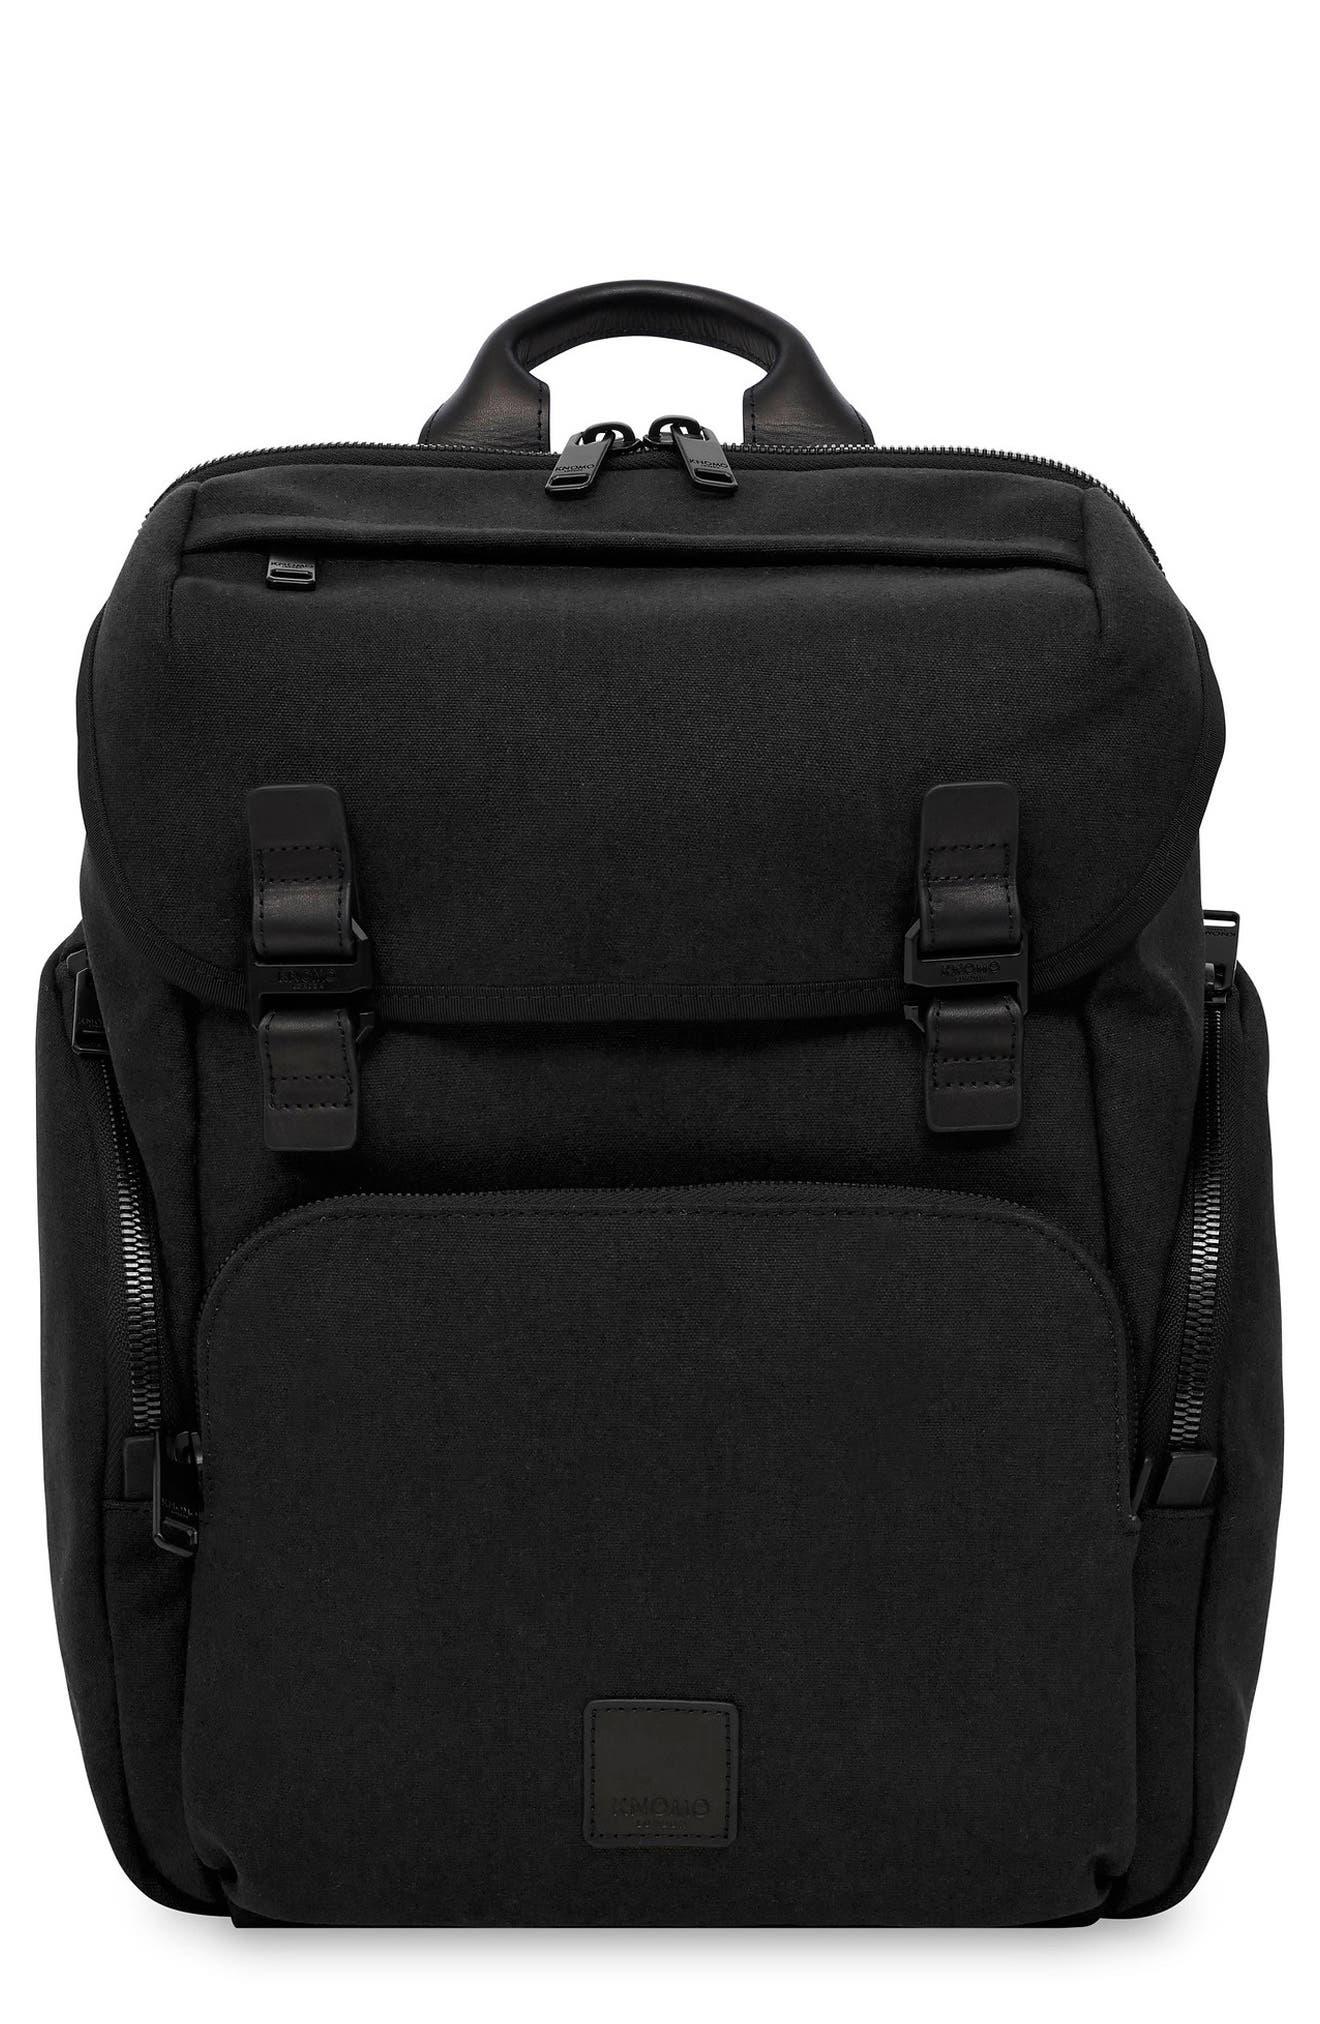 Knomo Fulham Thurloe Waxed Canvas Backpack with RFID Pocket,                             Main thumbnail 1, color,                             BLACK